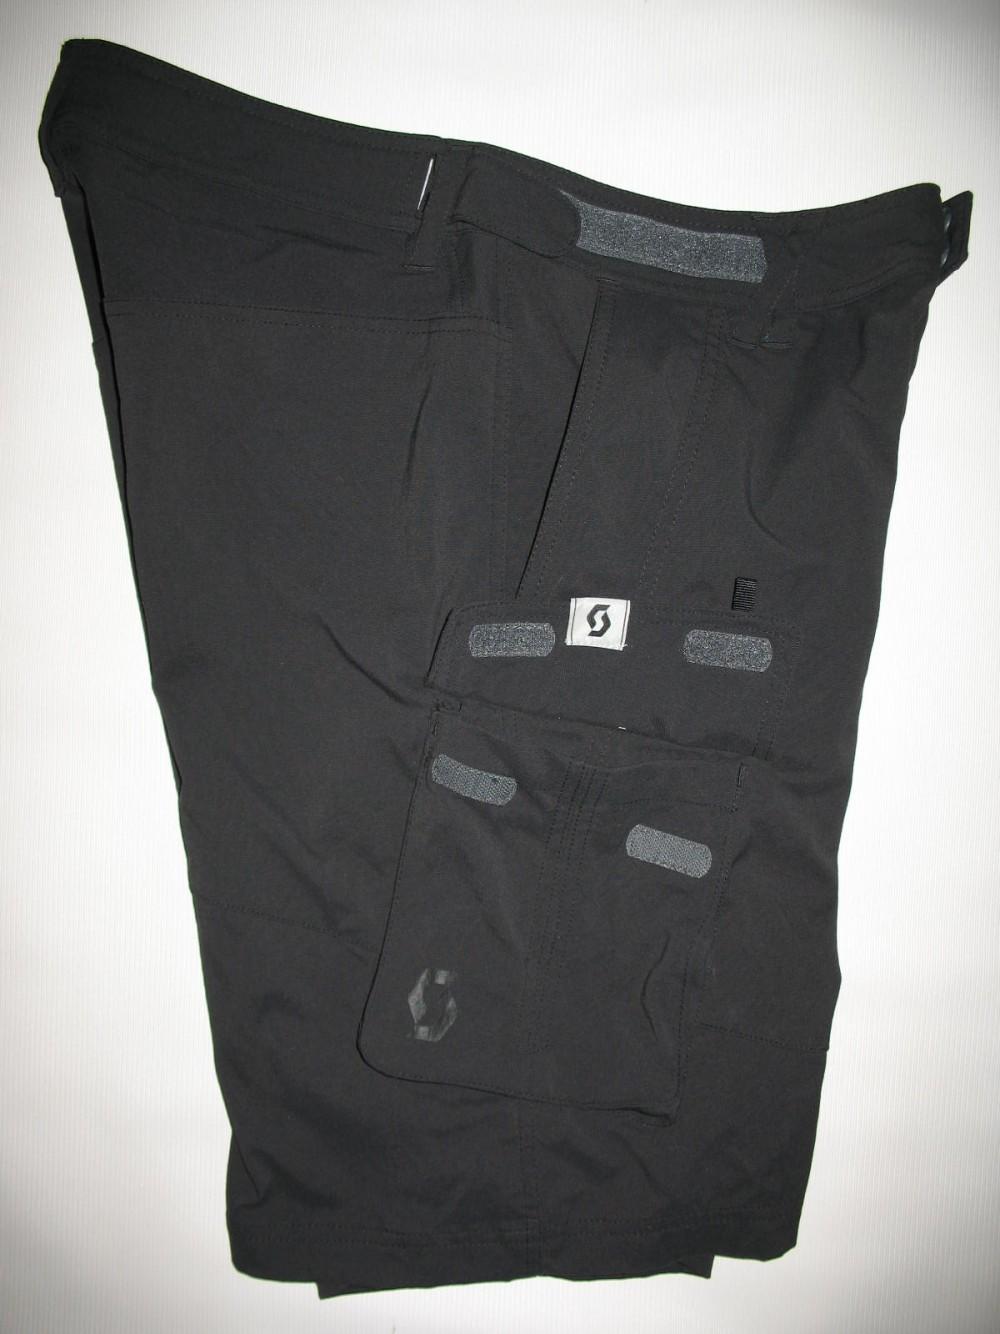 Велошорты SCOTT trail iam cycling shorts (размер M) - 5